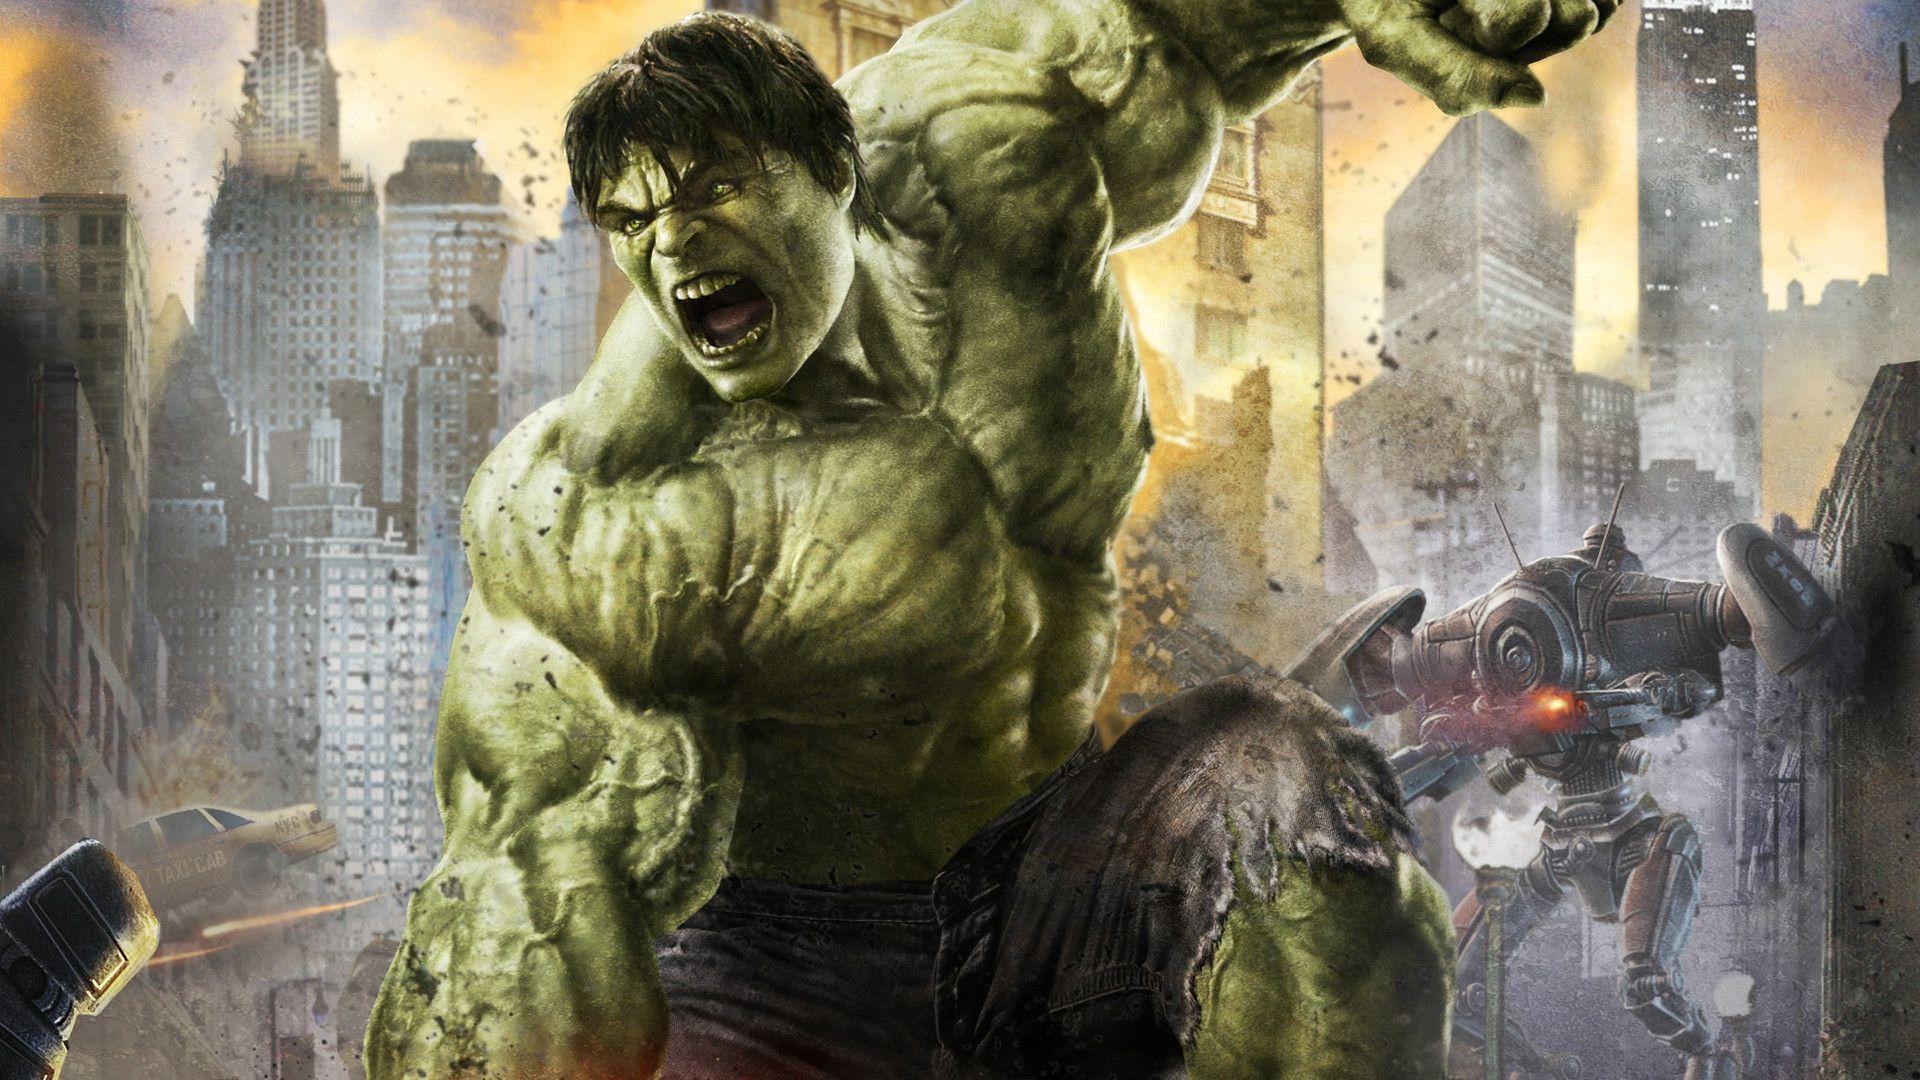 Incredible Hulk Hd Wallpapers Free Download Latest Incredible Hulk Hd Wallpapers For Computer Mobile Iphone Ipad Or A The Incredibles Incredible Hulk Hulk